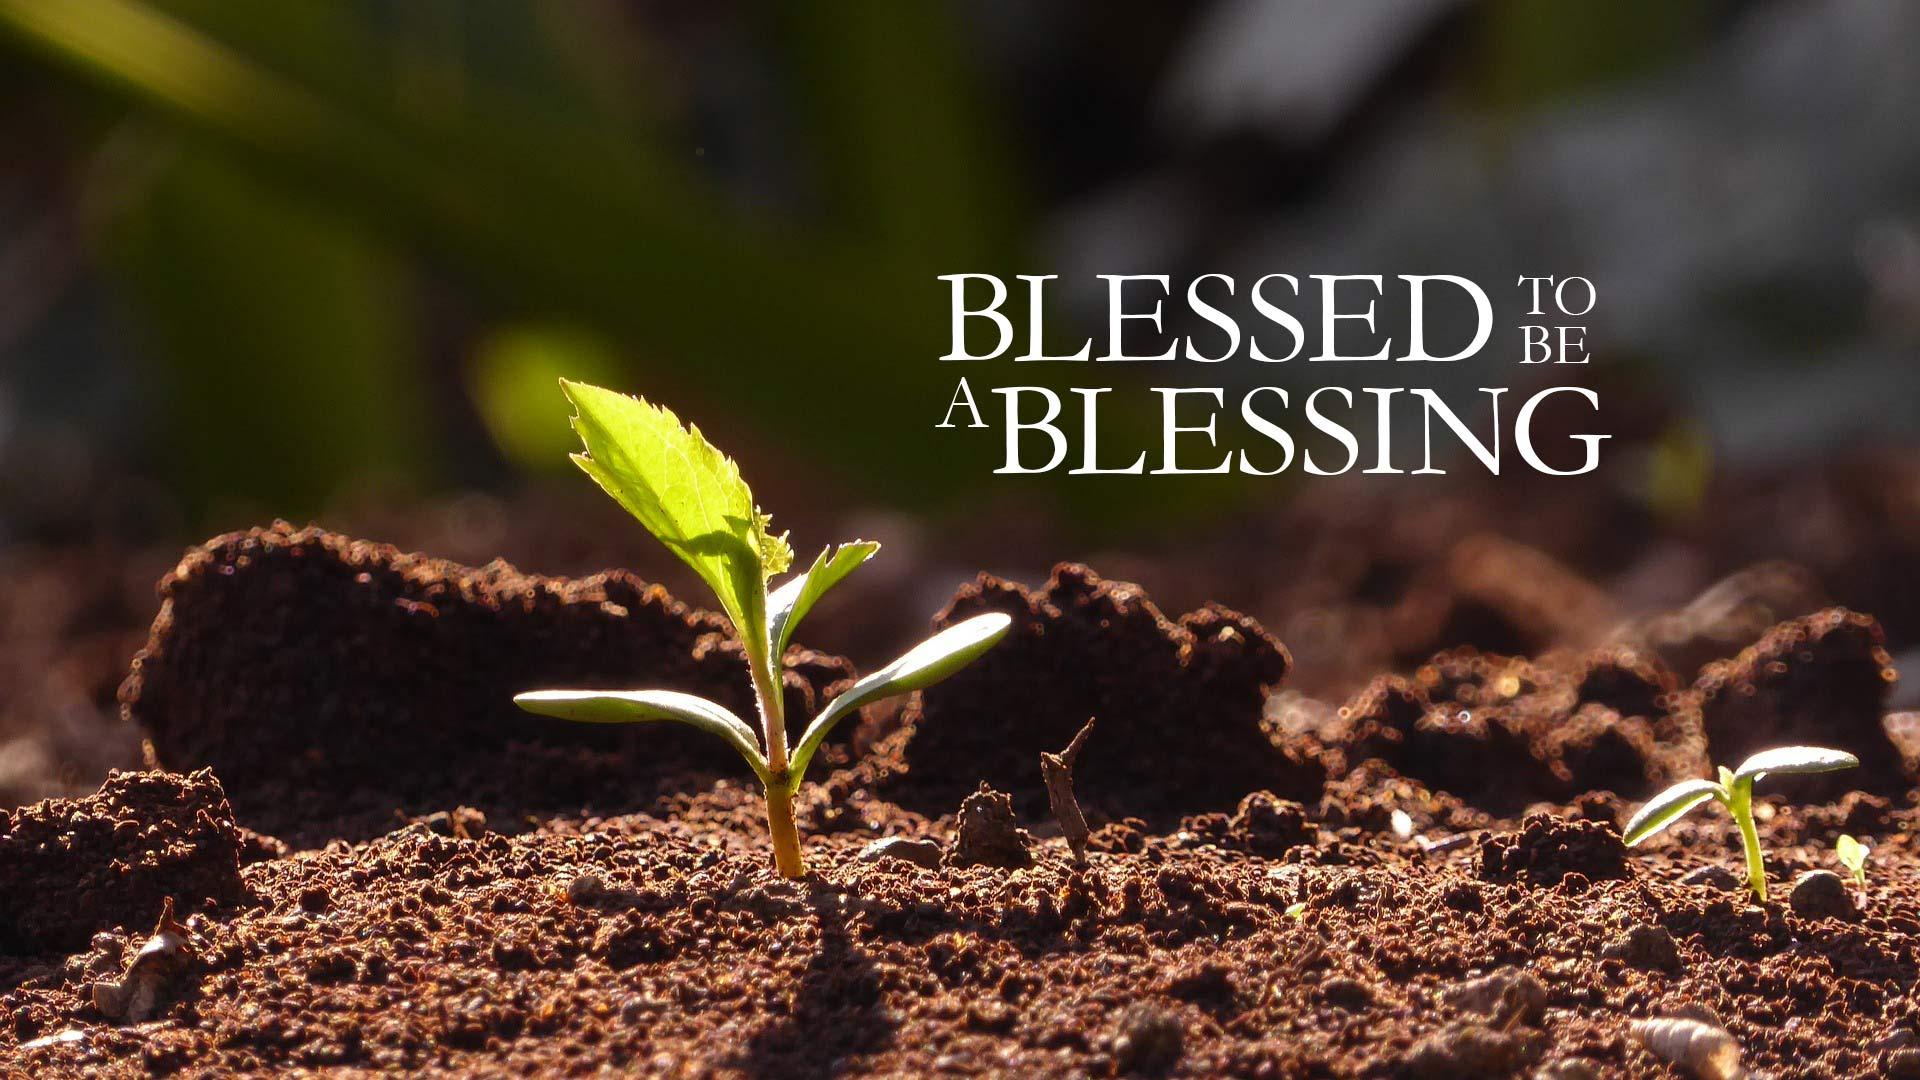 blessed-blessing